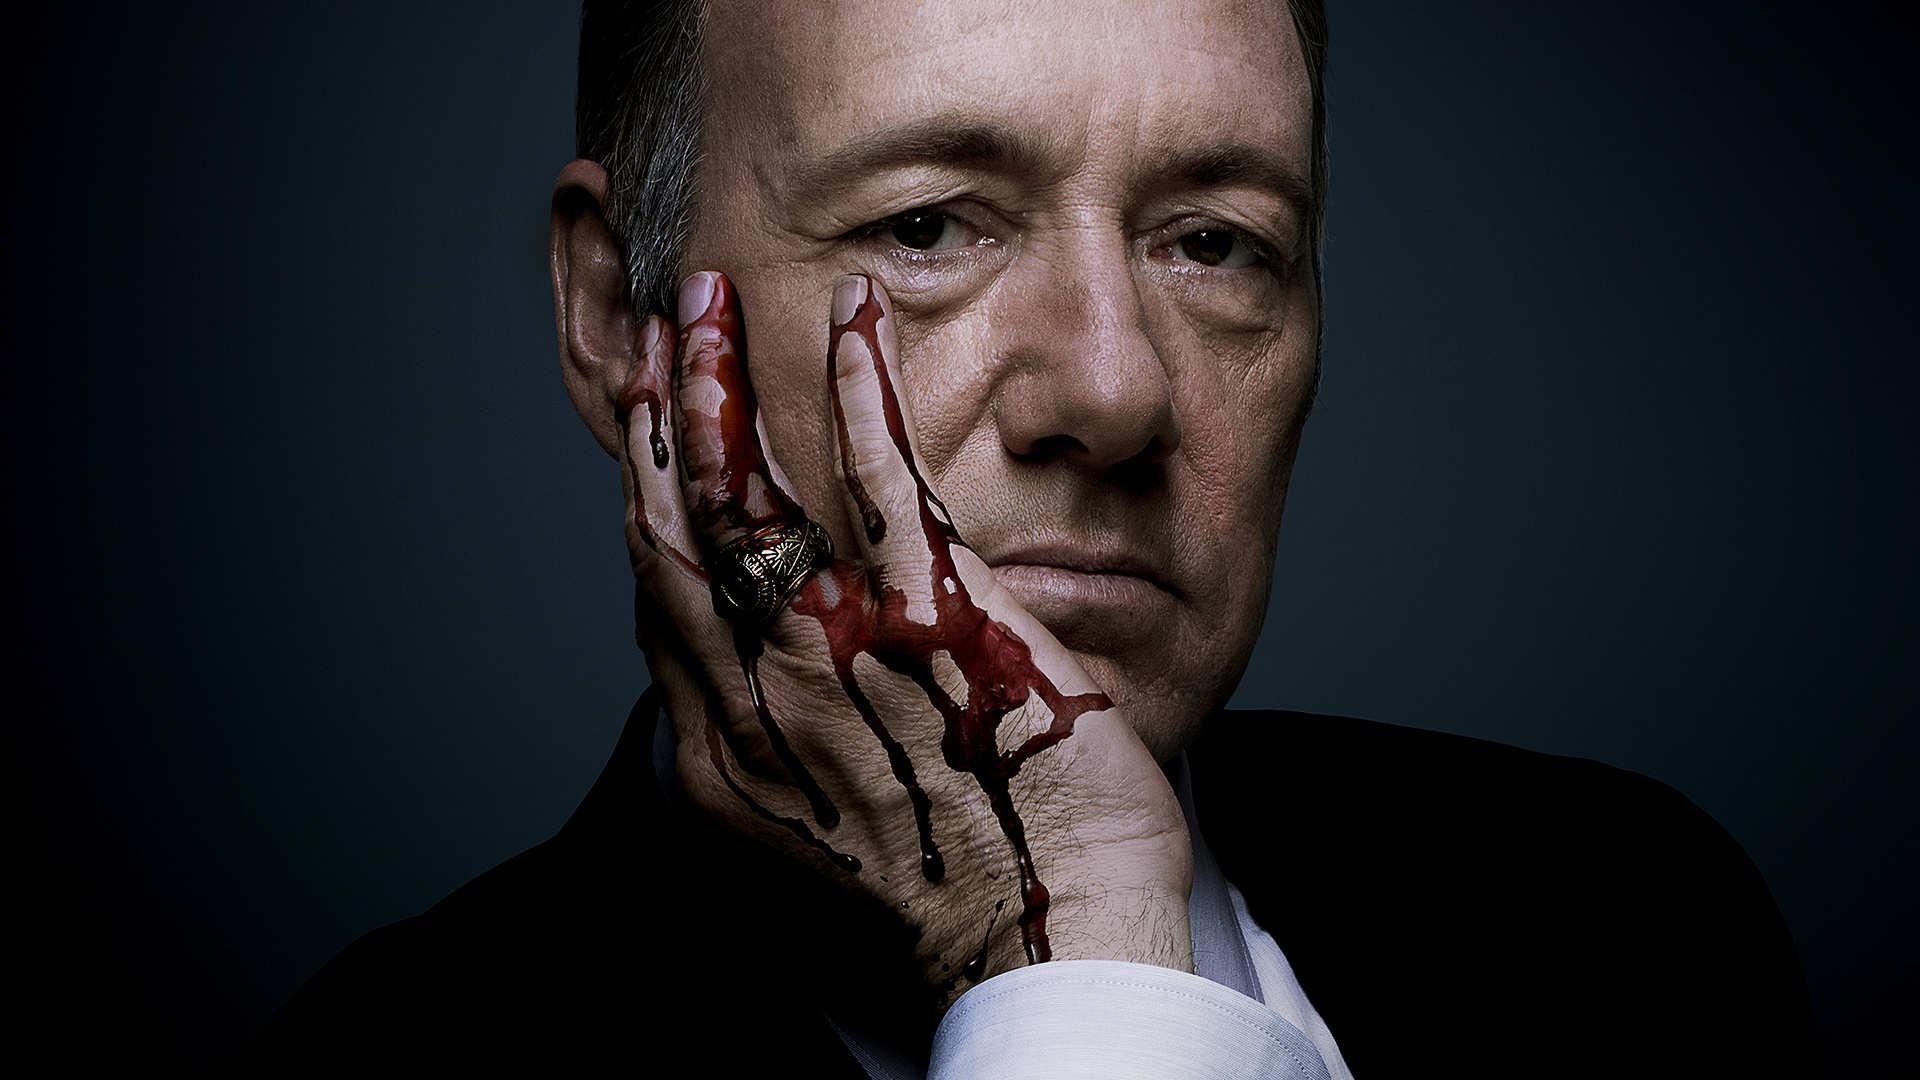 Frank Underwood Blood Hands